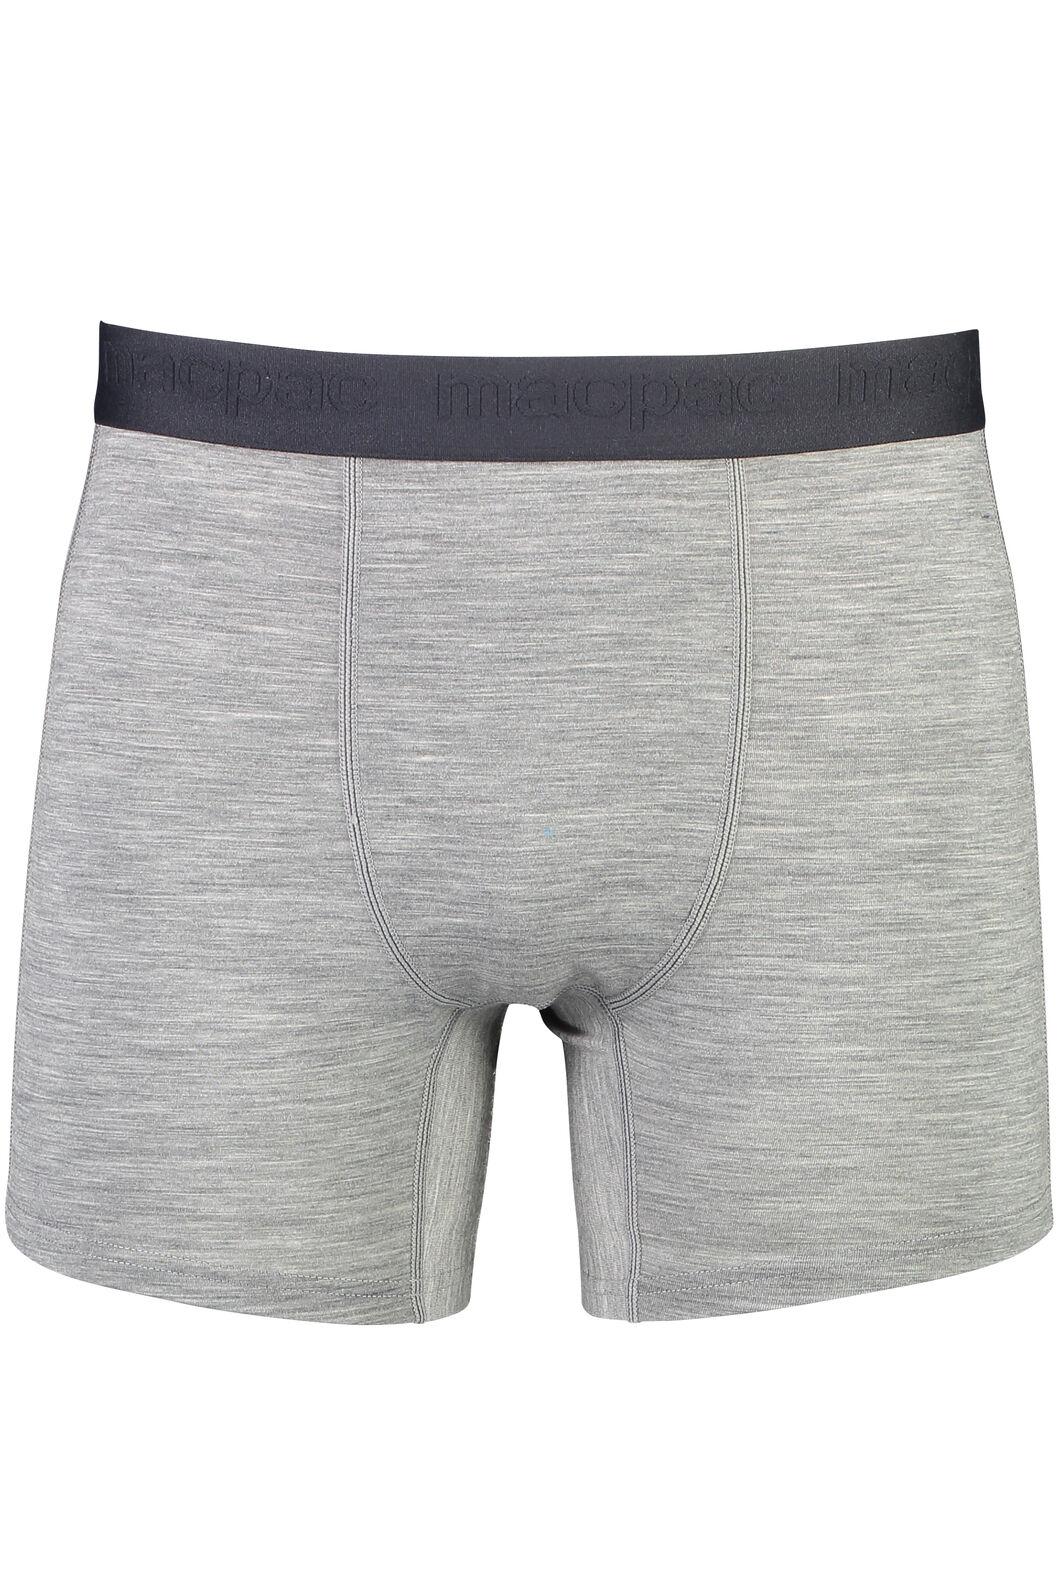 180 Merino Boxers - Men's, Grey Marle/Black, hi-res